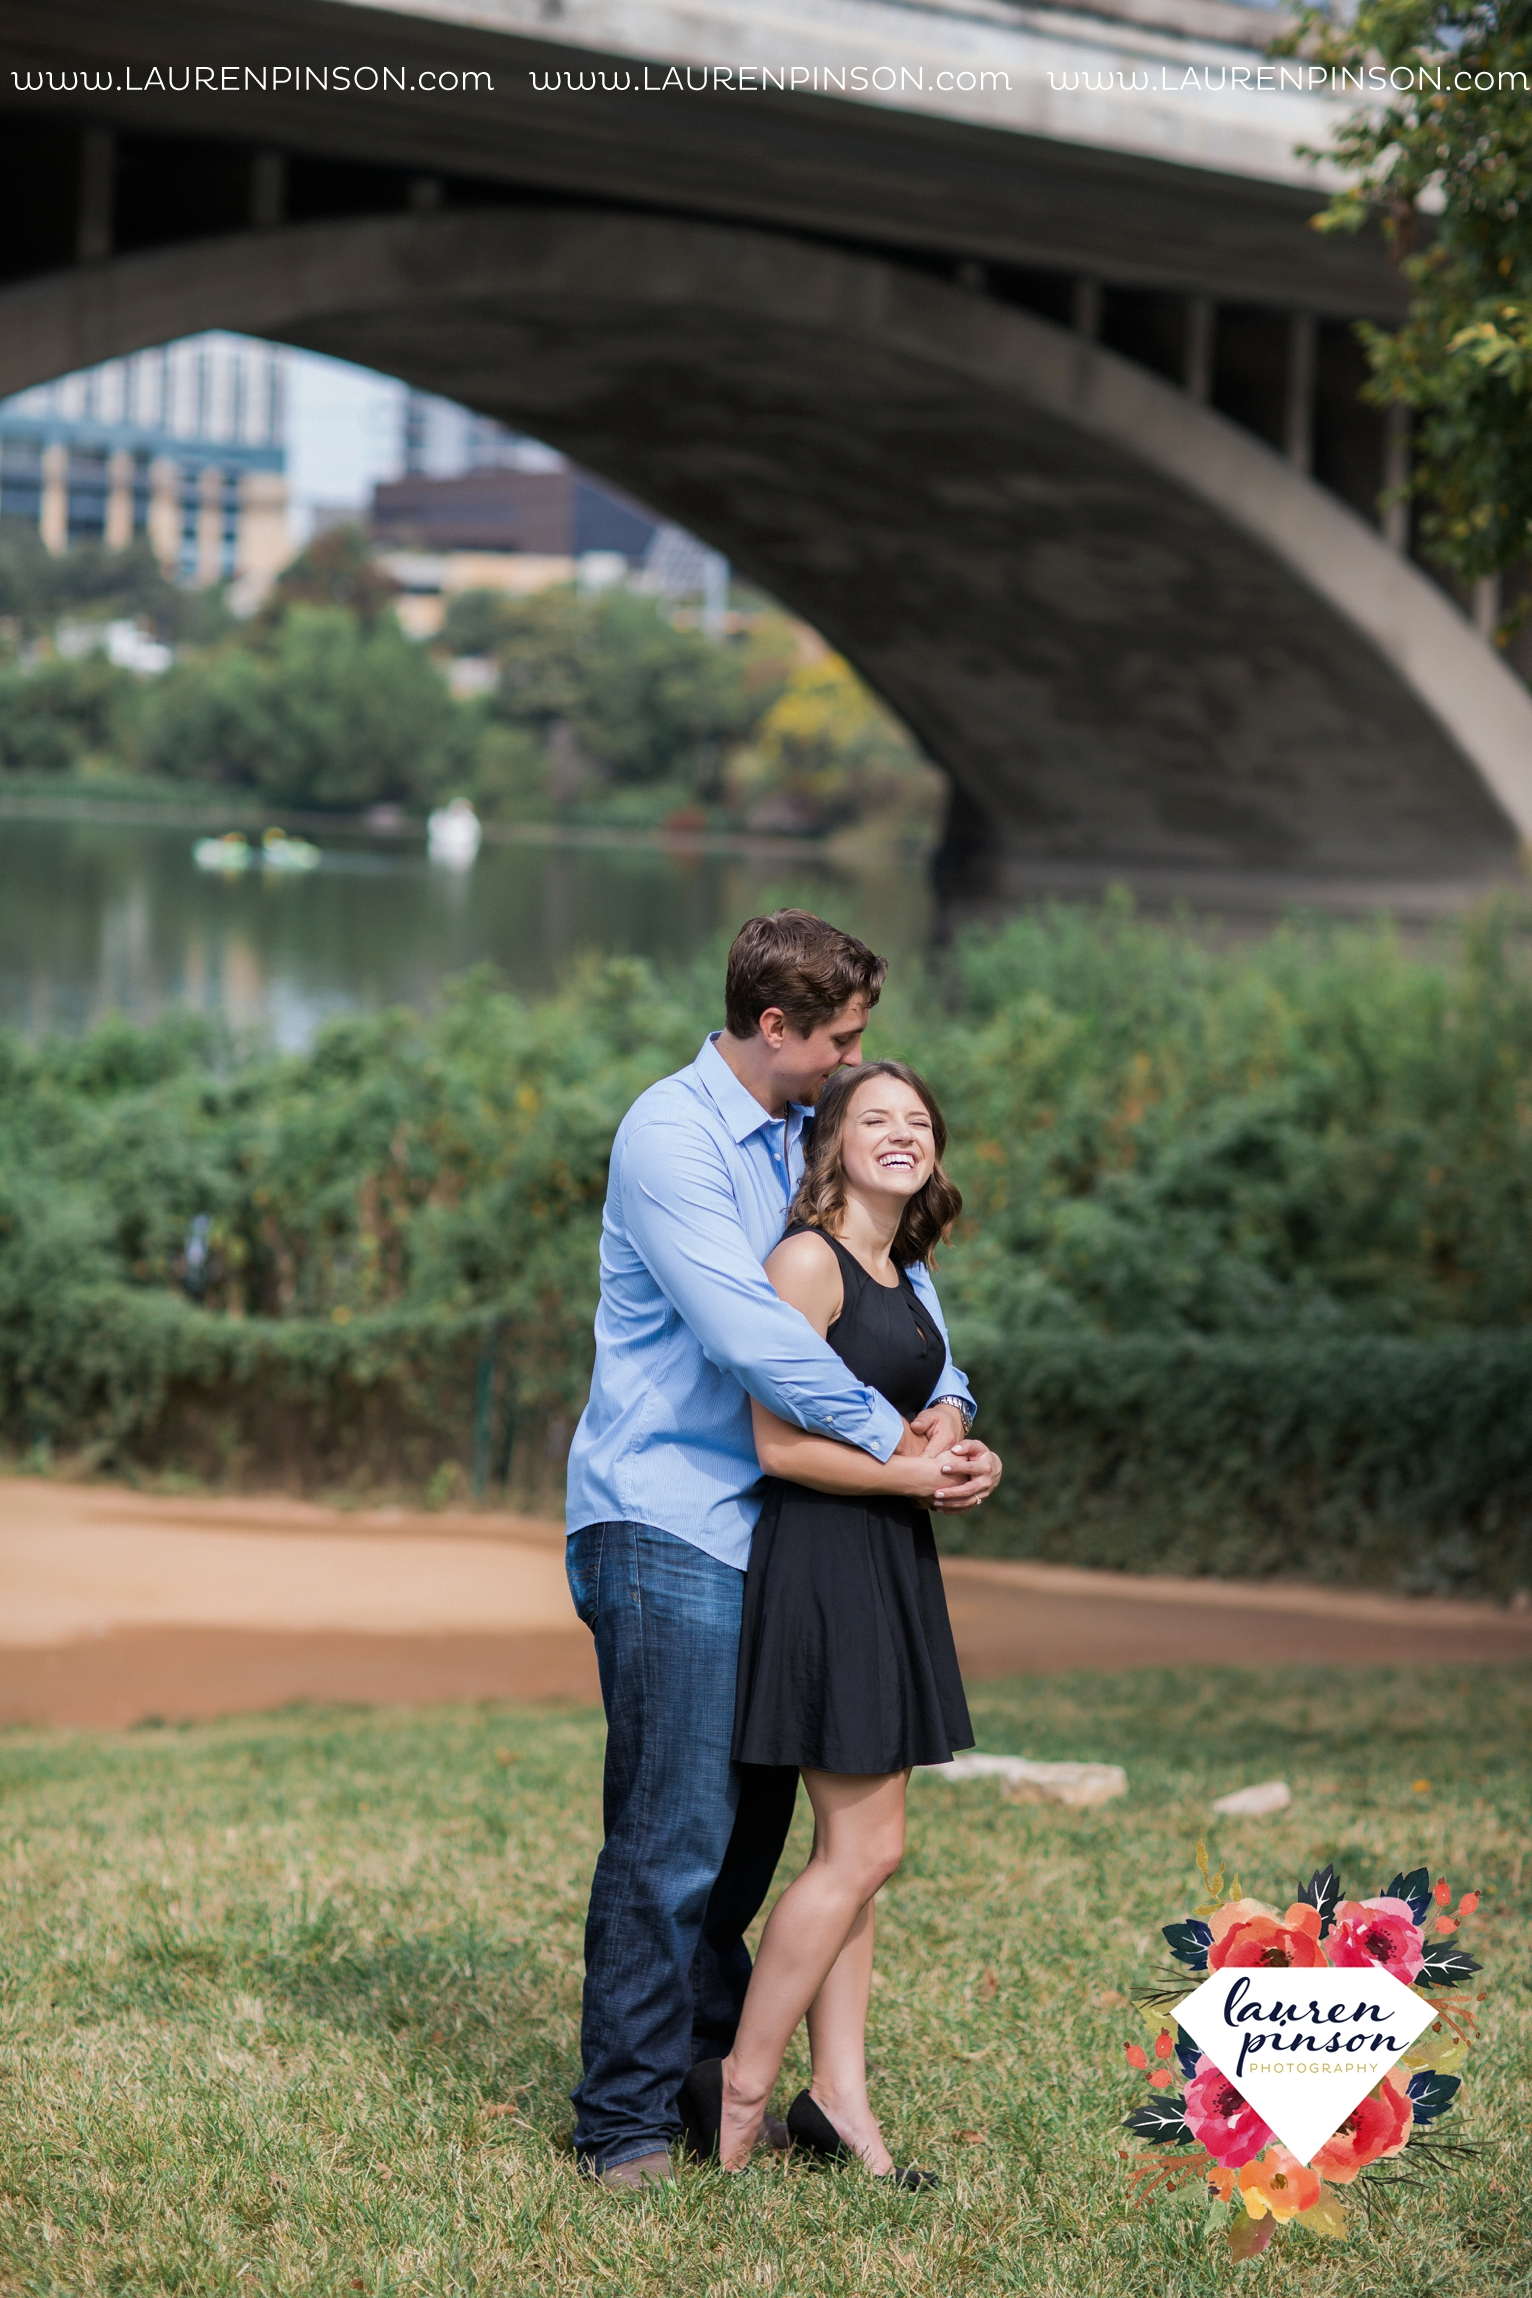 austin-texas-engagement-session-photography-by-wichita-falls-wedding-photgraphy-lauren-pinson_1401.jpg